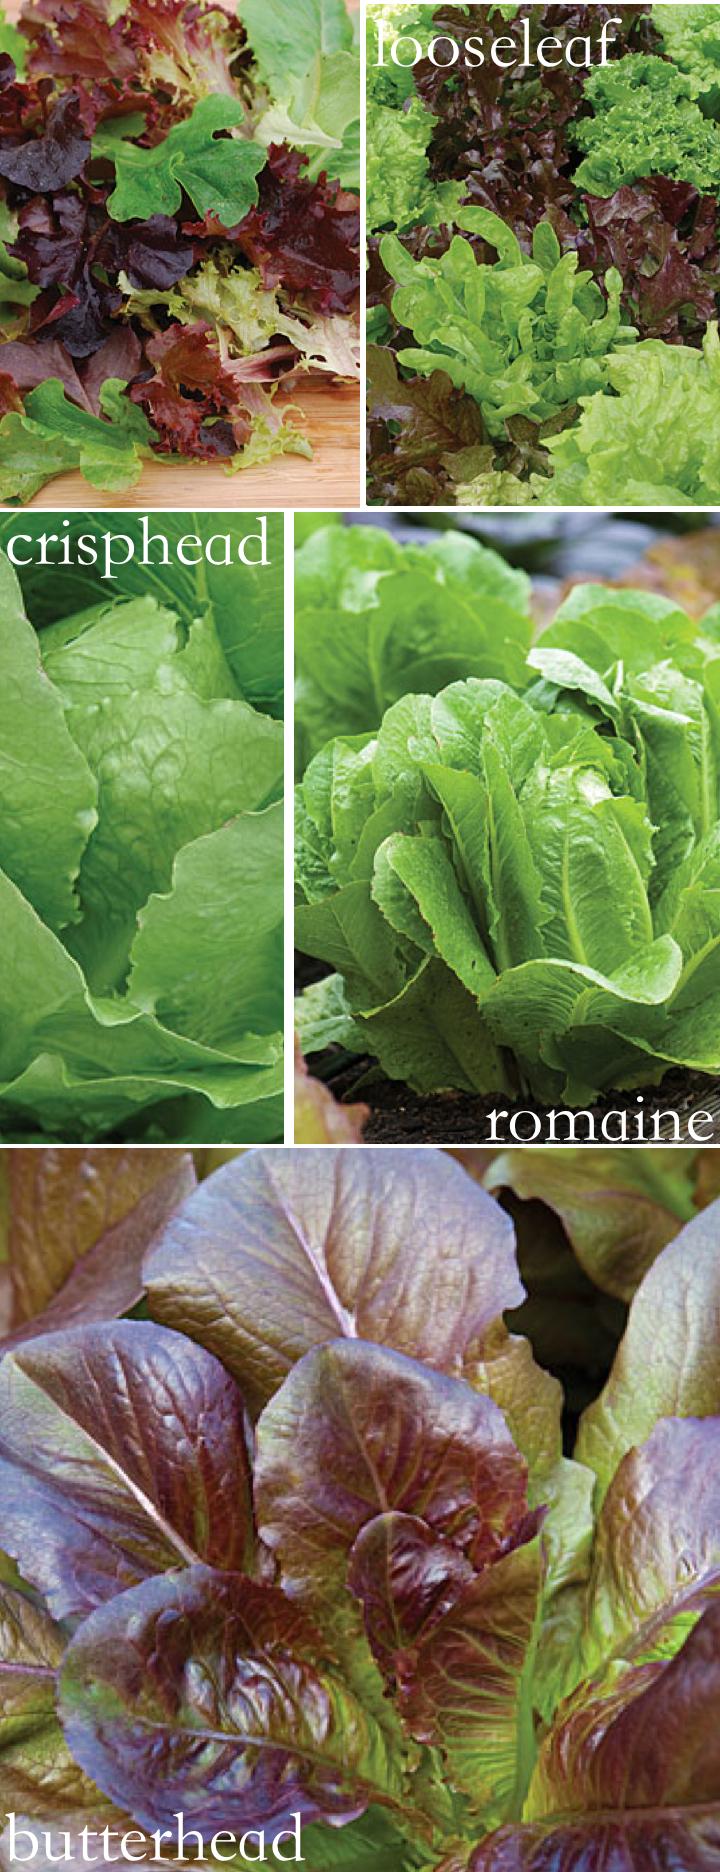 lettuce-georgehirsch.jpg